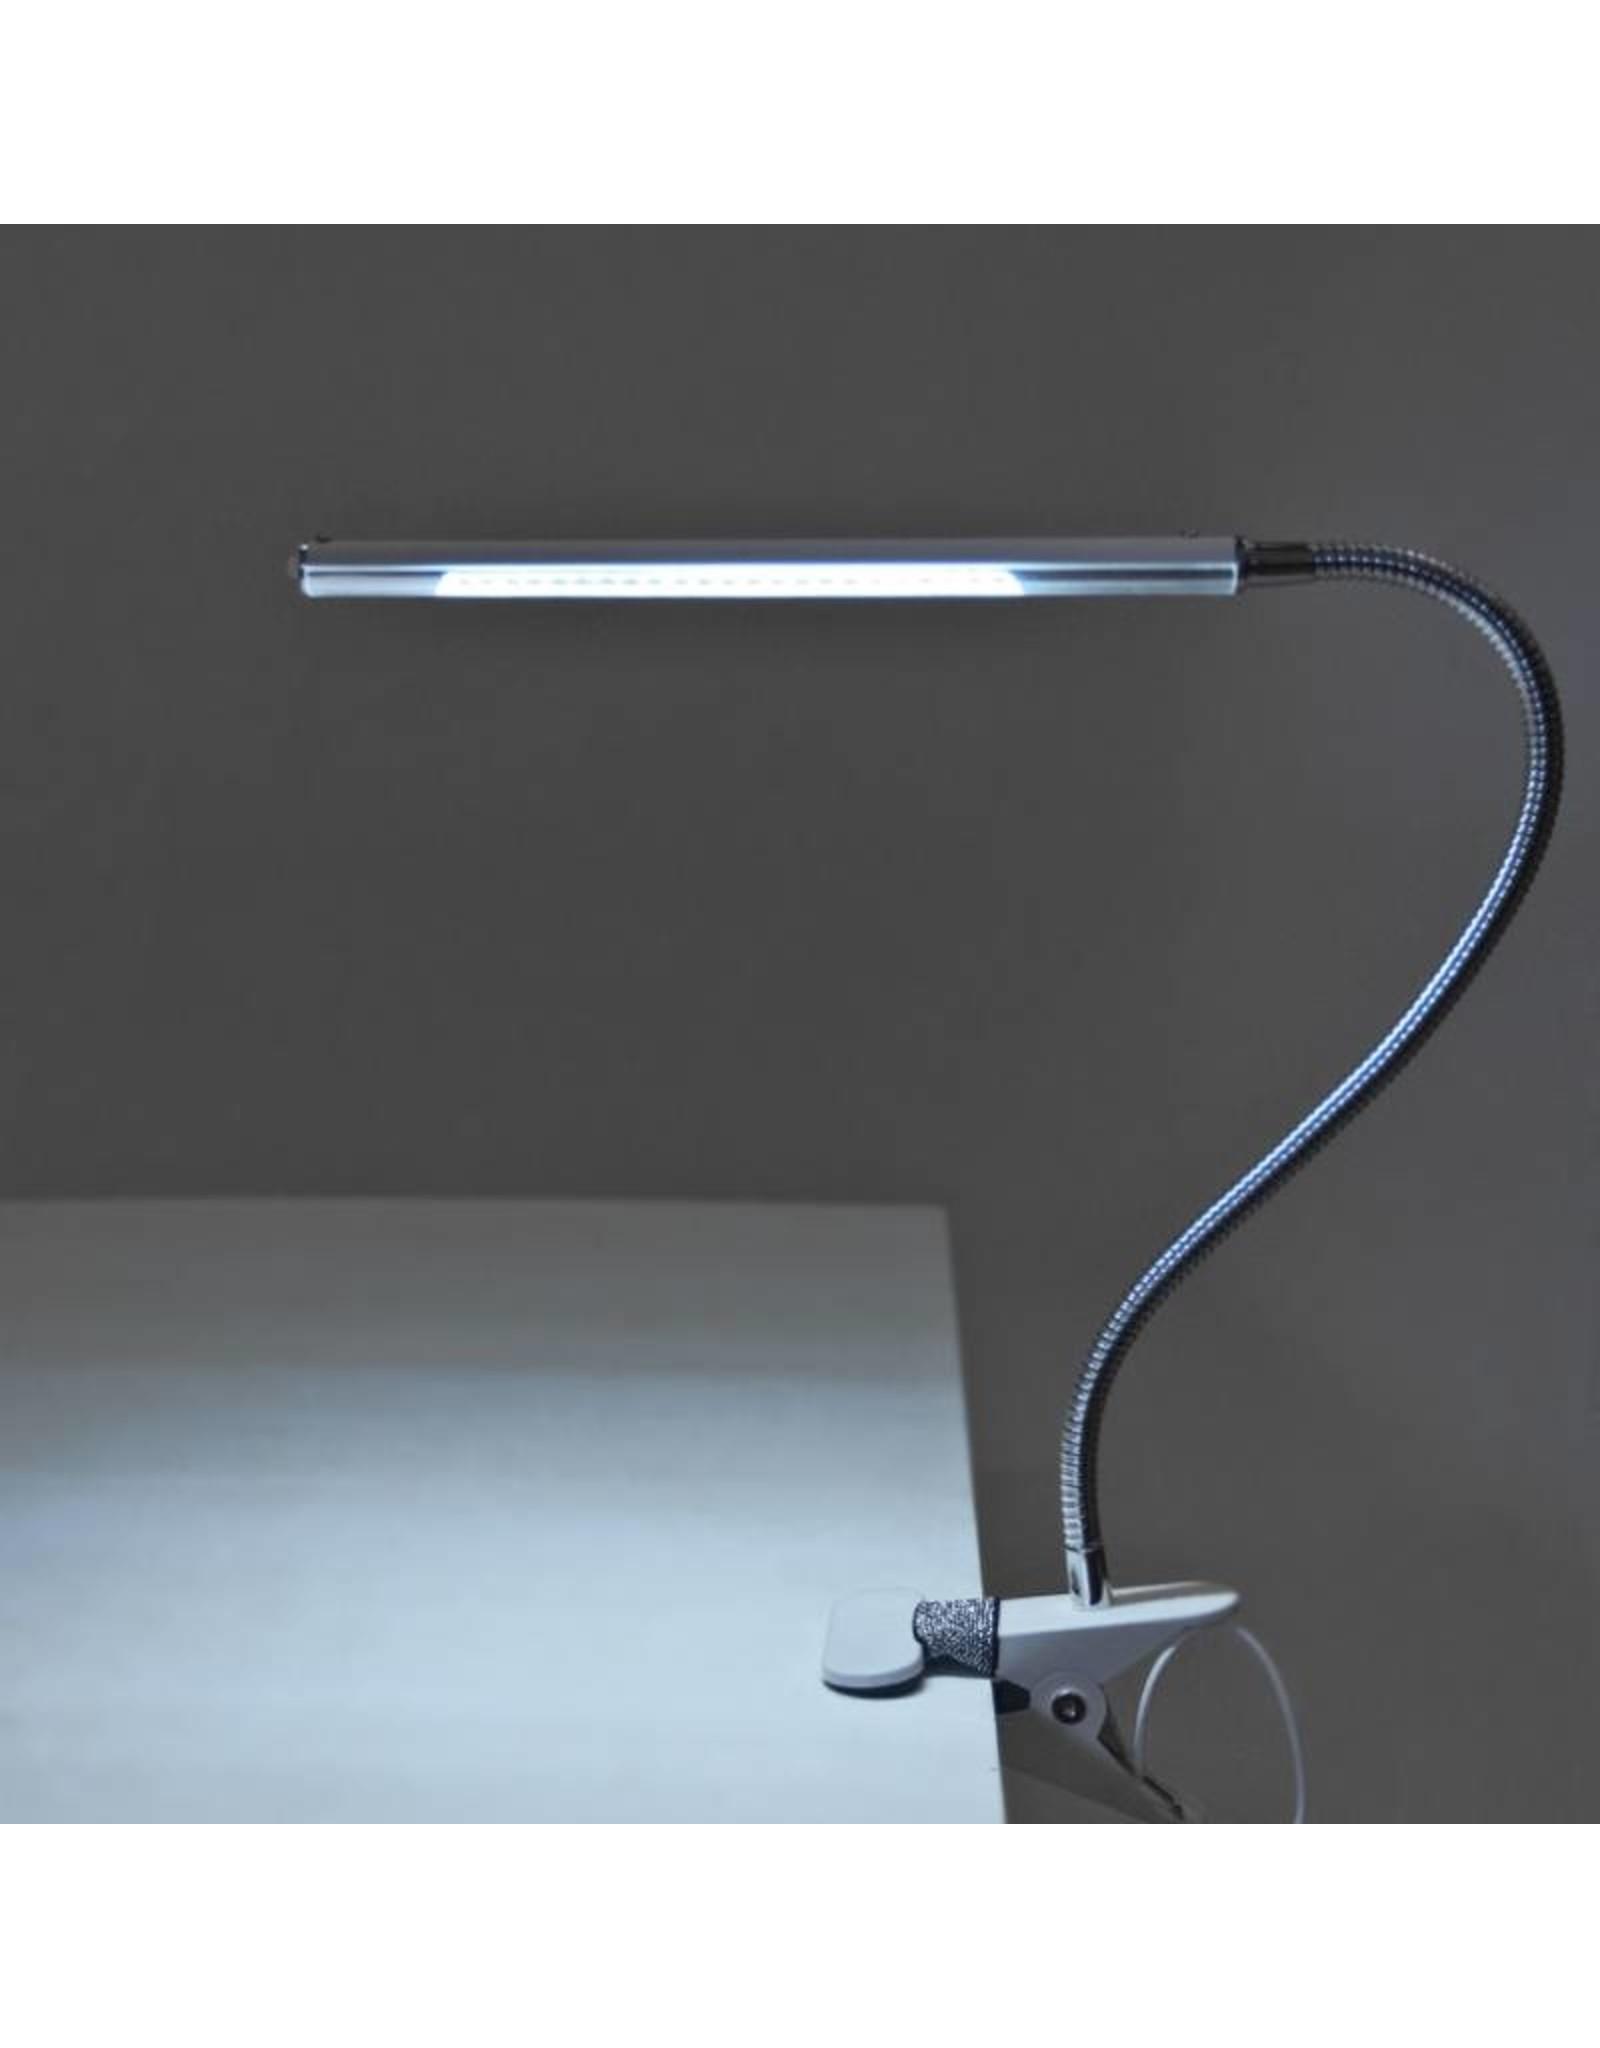 Mega Beauty Shop® LED Tafellamp Blauw met een flexibele arm op tafelklem.